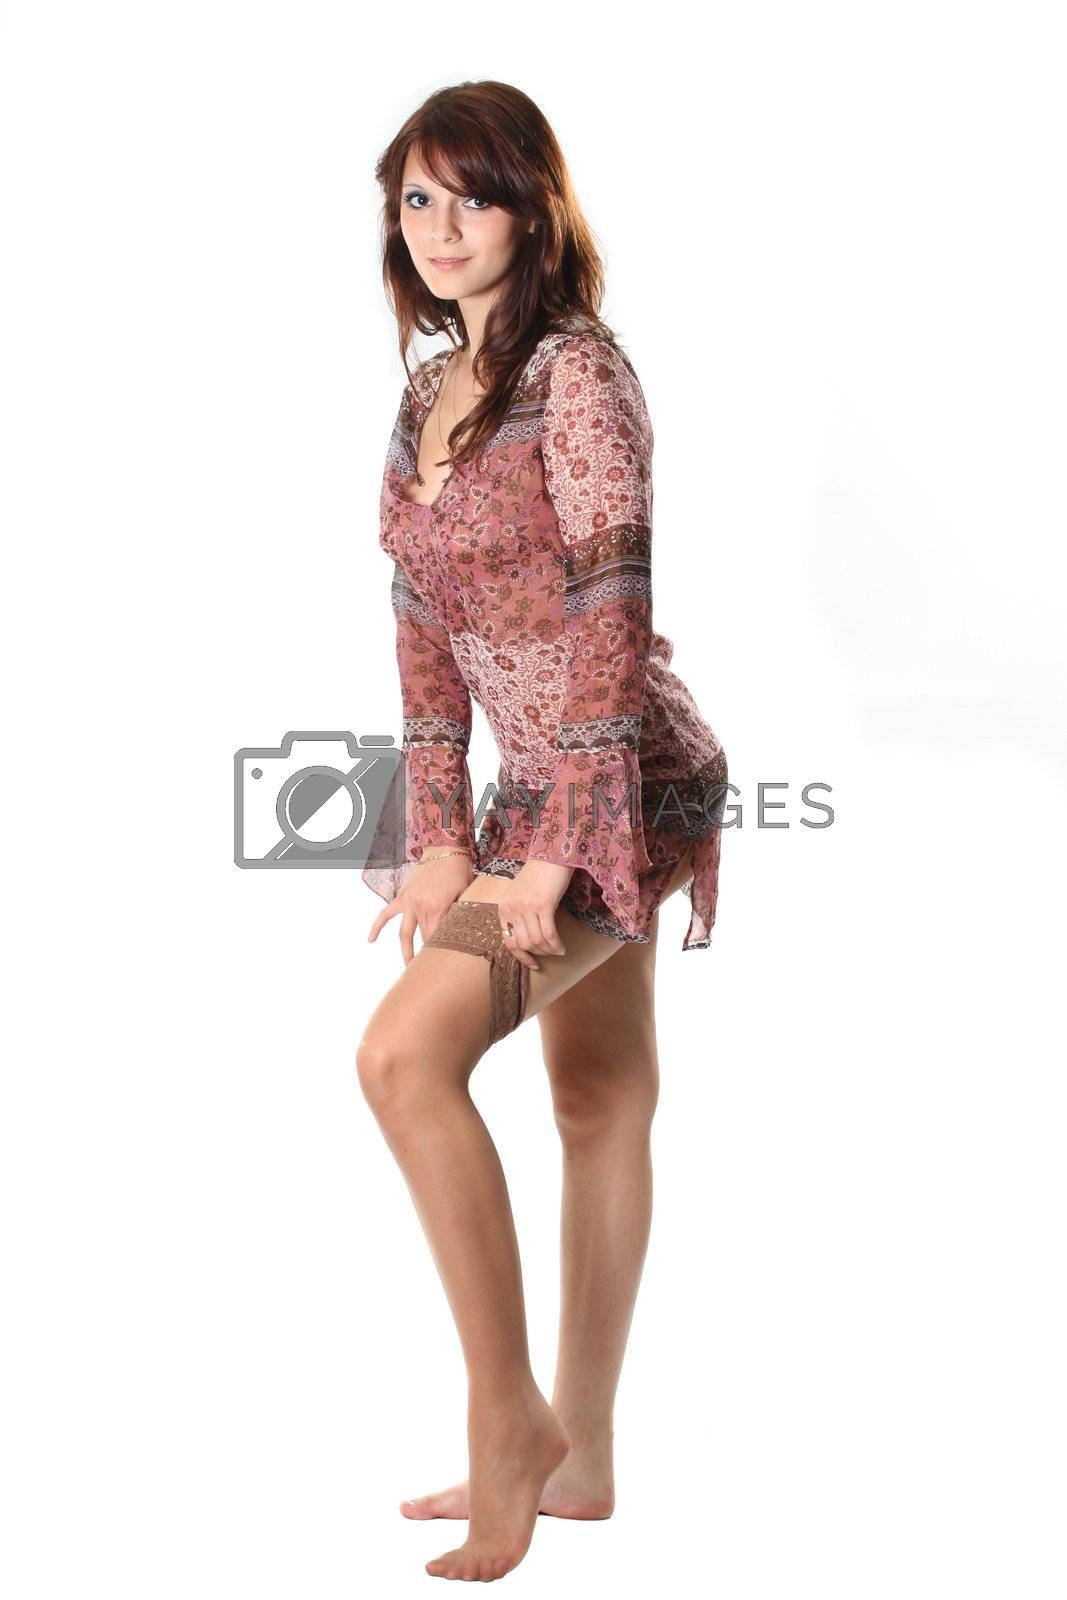 women beauty sensuality stockings sexual girl lingerie